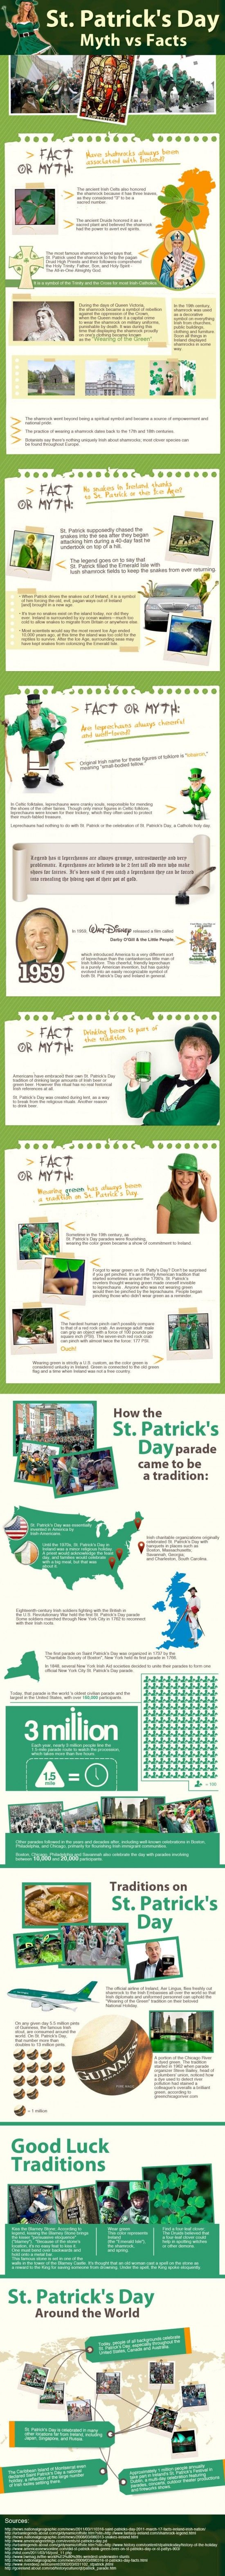 St. Patrick's Day Myth Vs. Fact